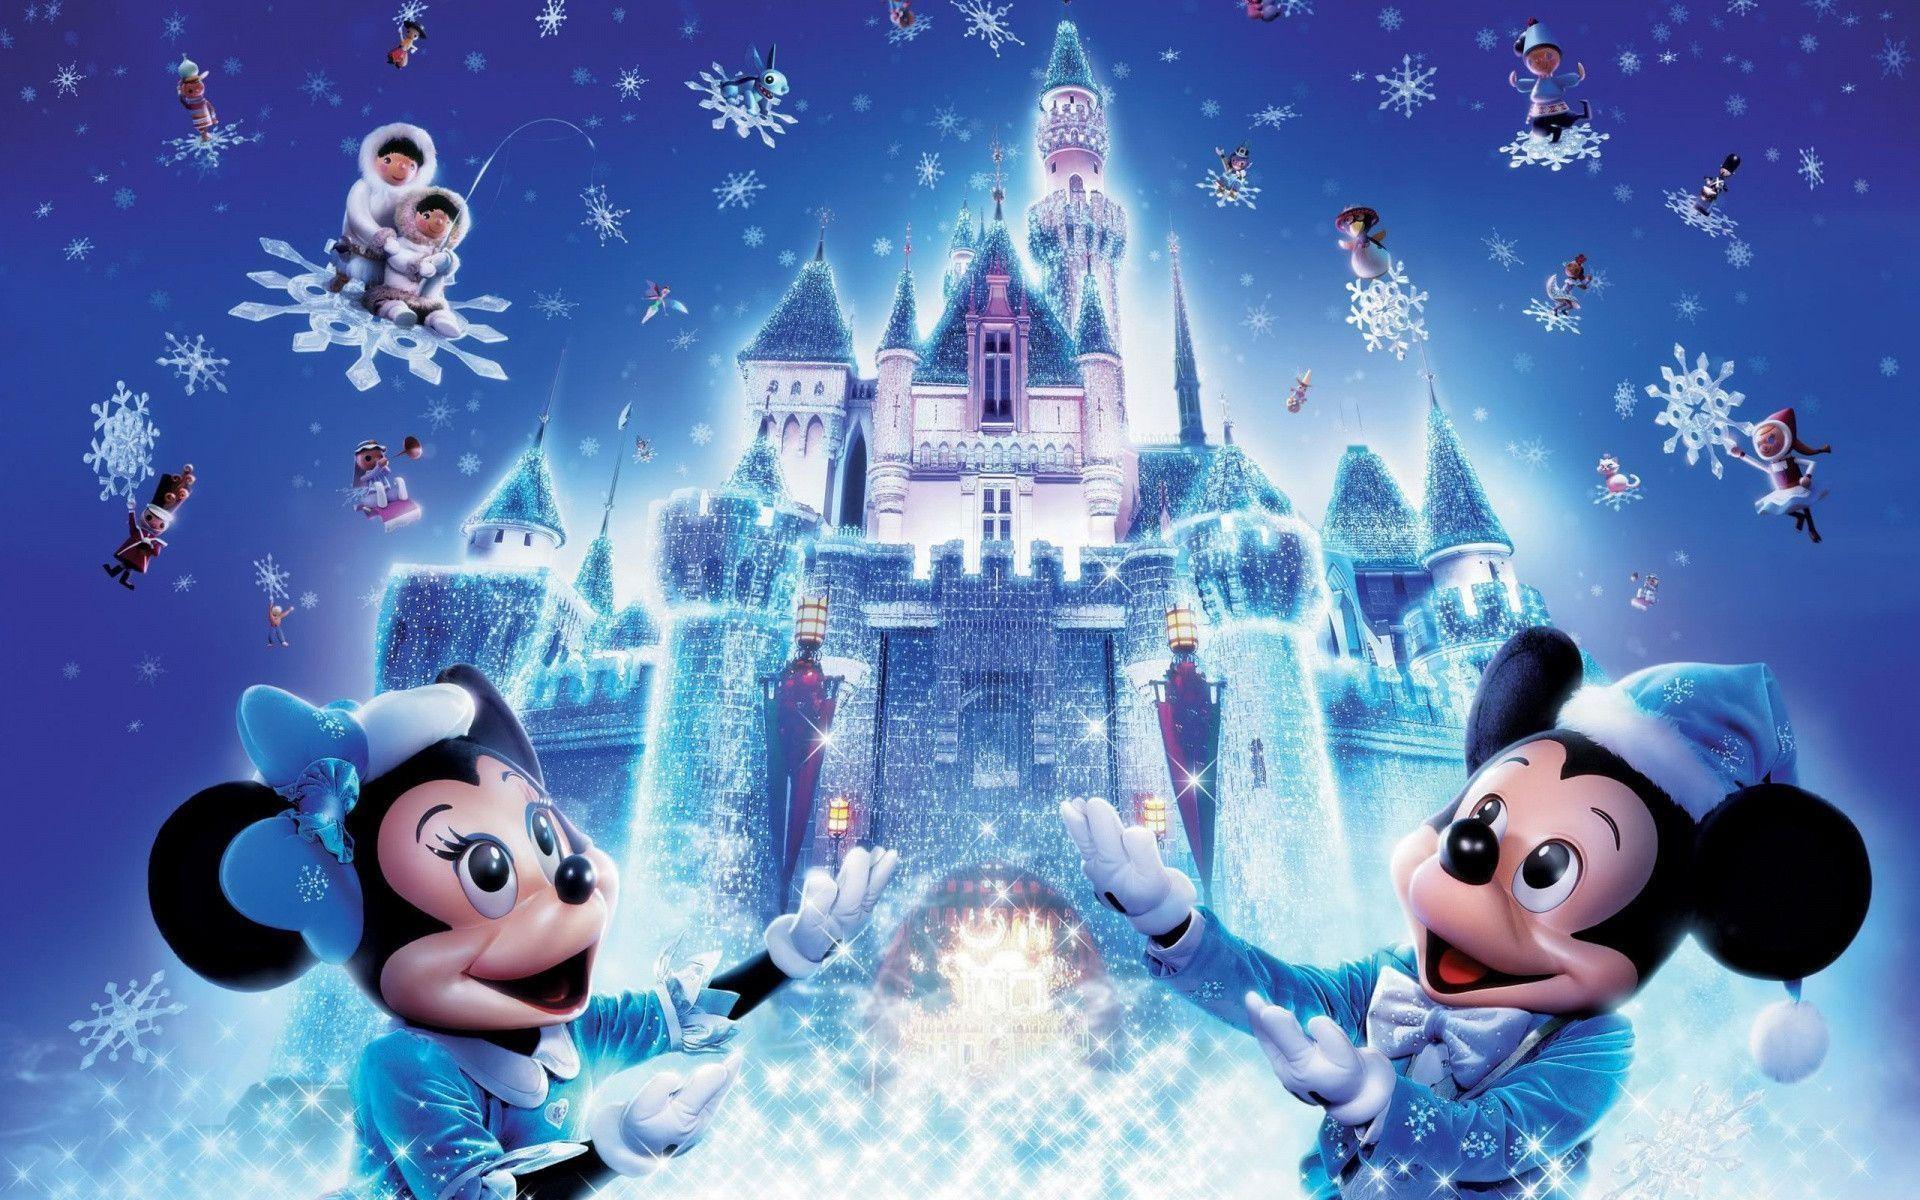 Disney Christmas Wallpapers – Full HD wallpaper search